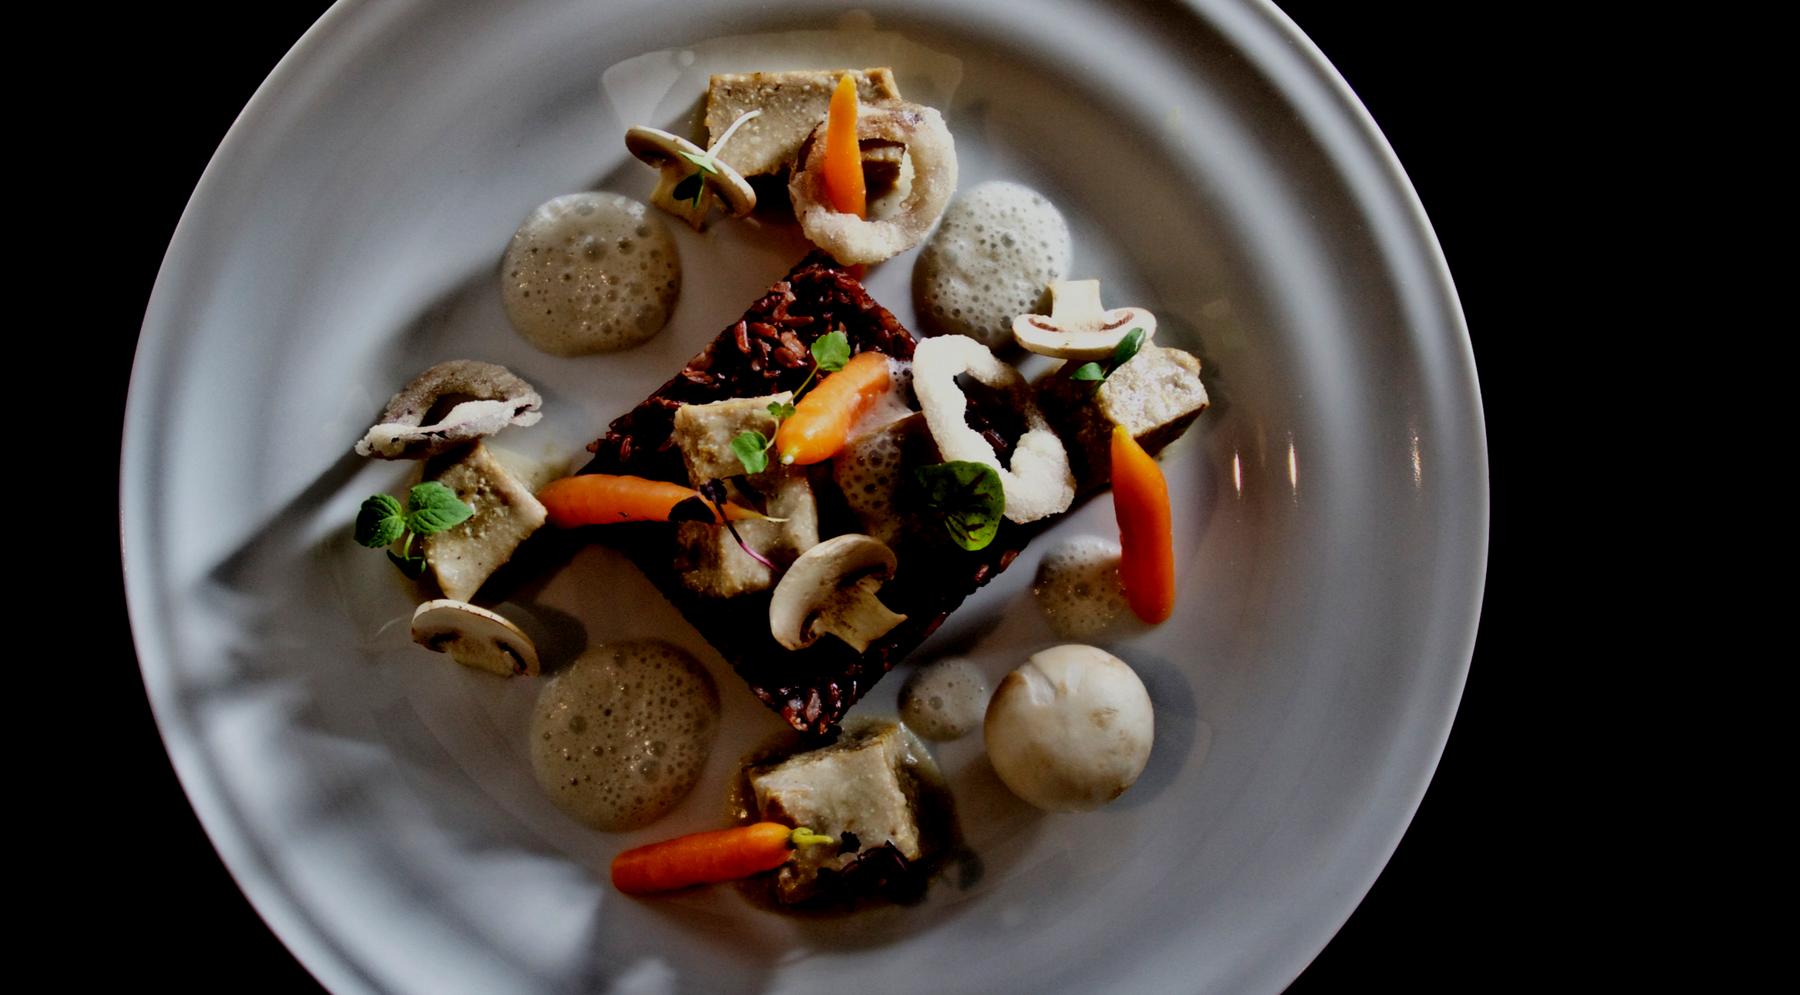 gourmet vegetarian restaurant - HD1800×995